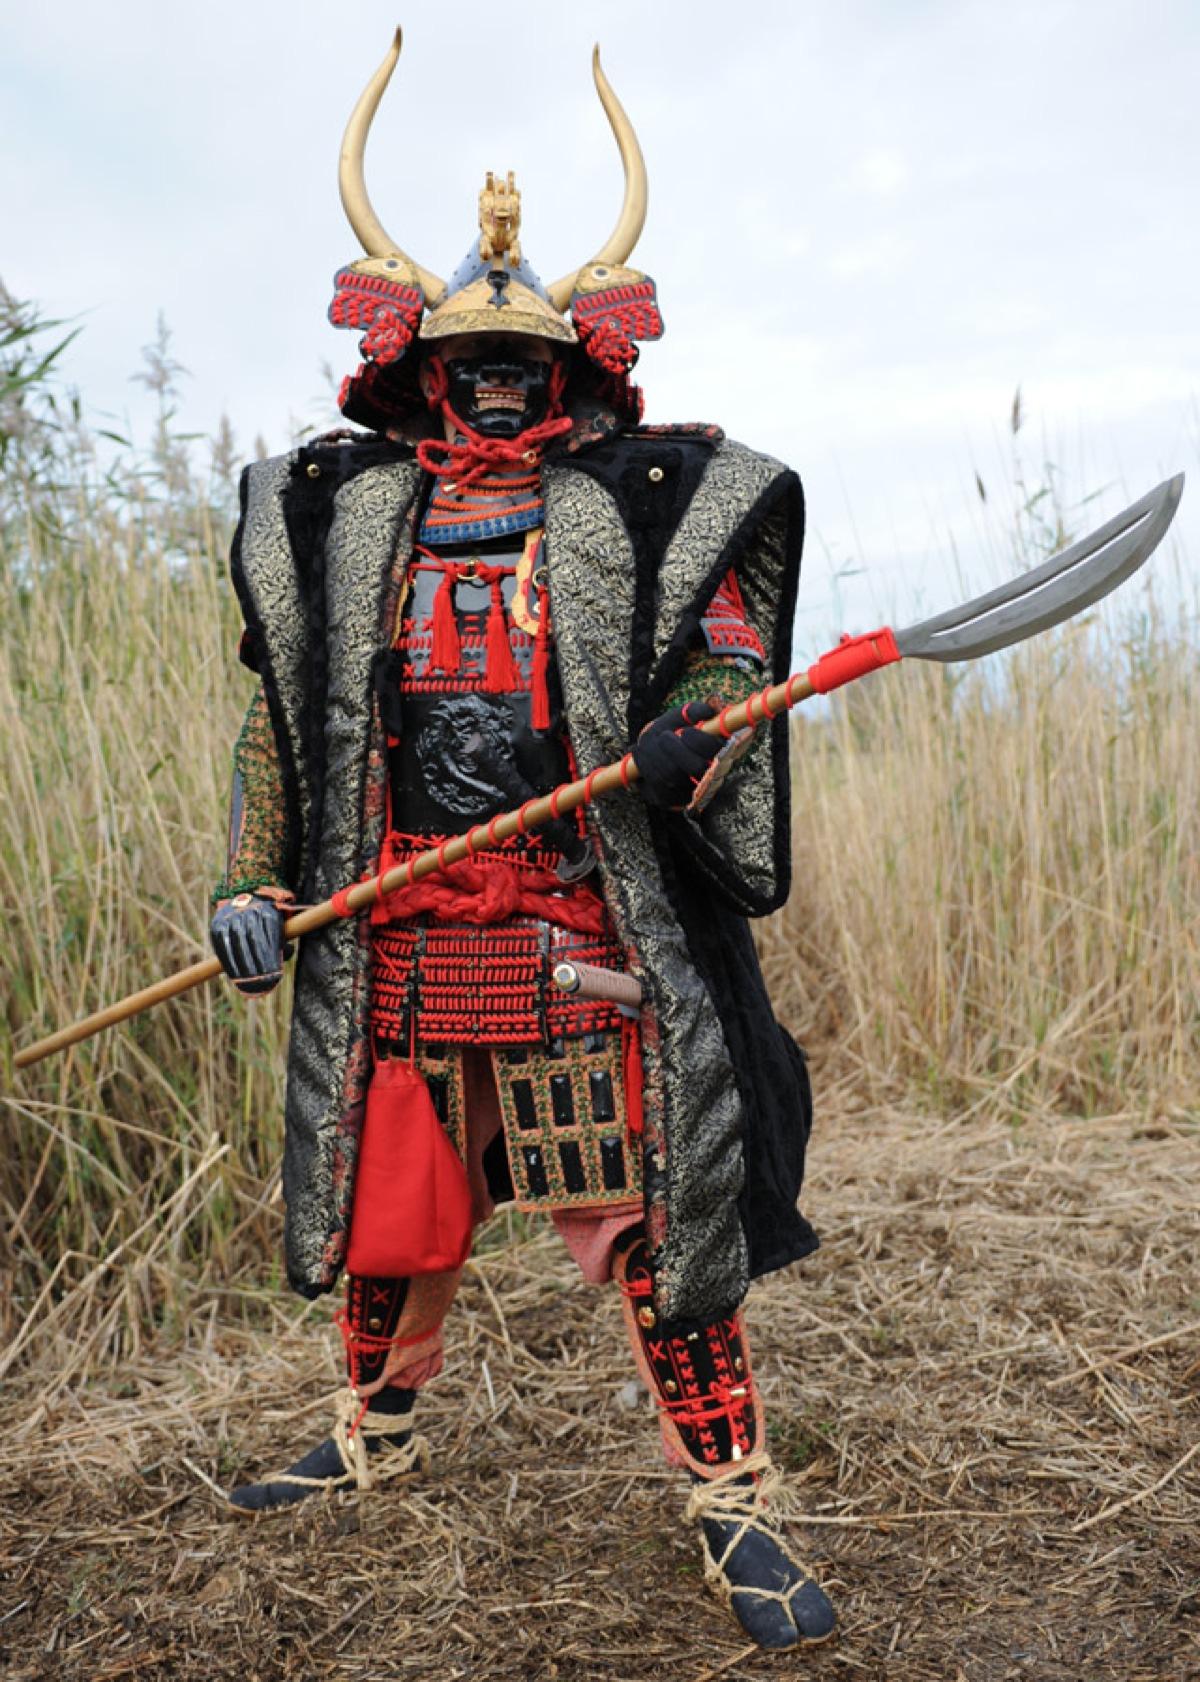 The Golden Dragon – The Last Daimyo seeking Samurai ...